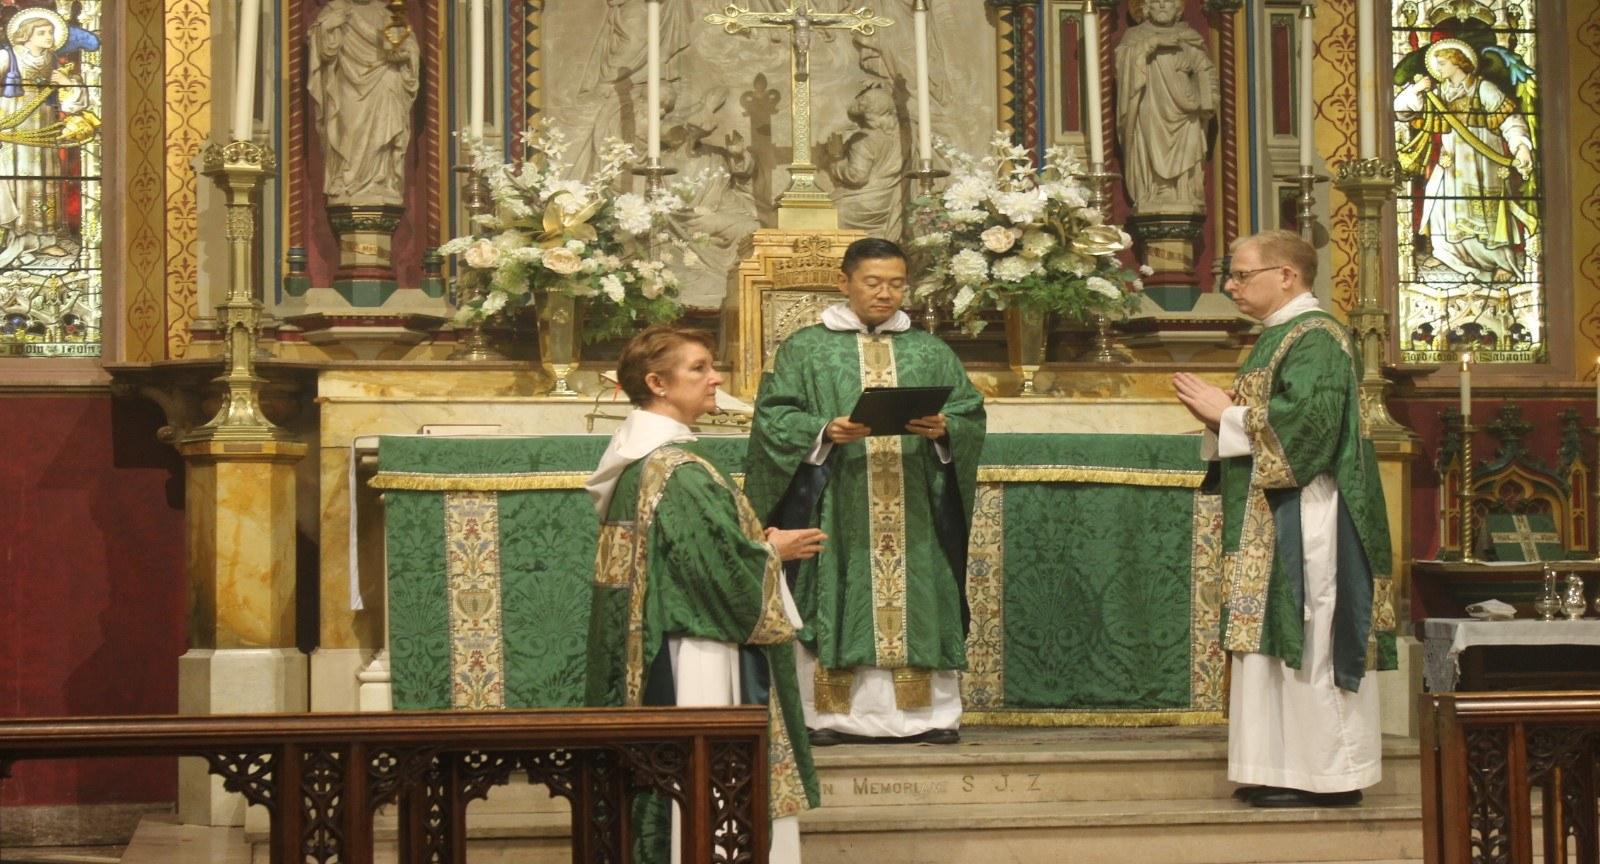 An Anglo-Catholic parish in Manhattan's NoMad neighborhood